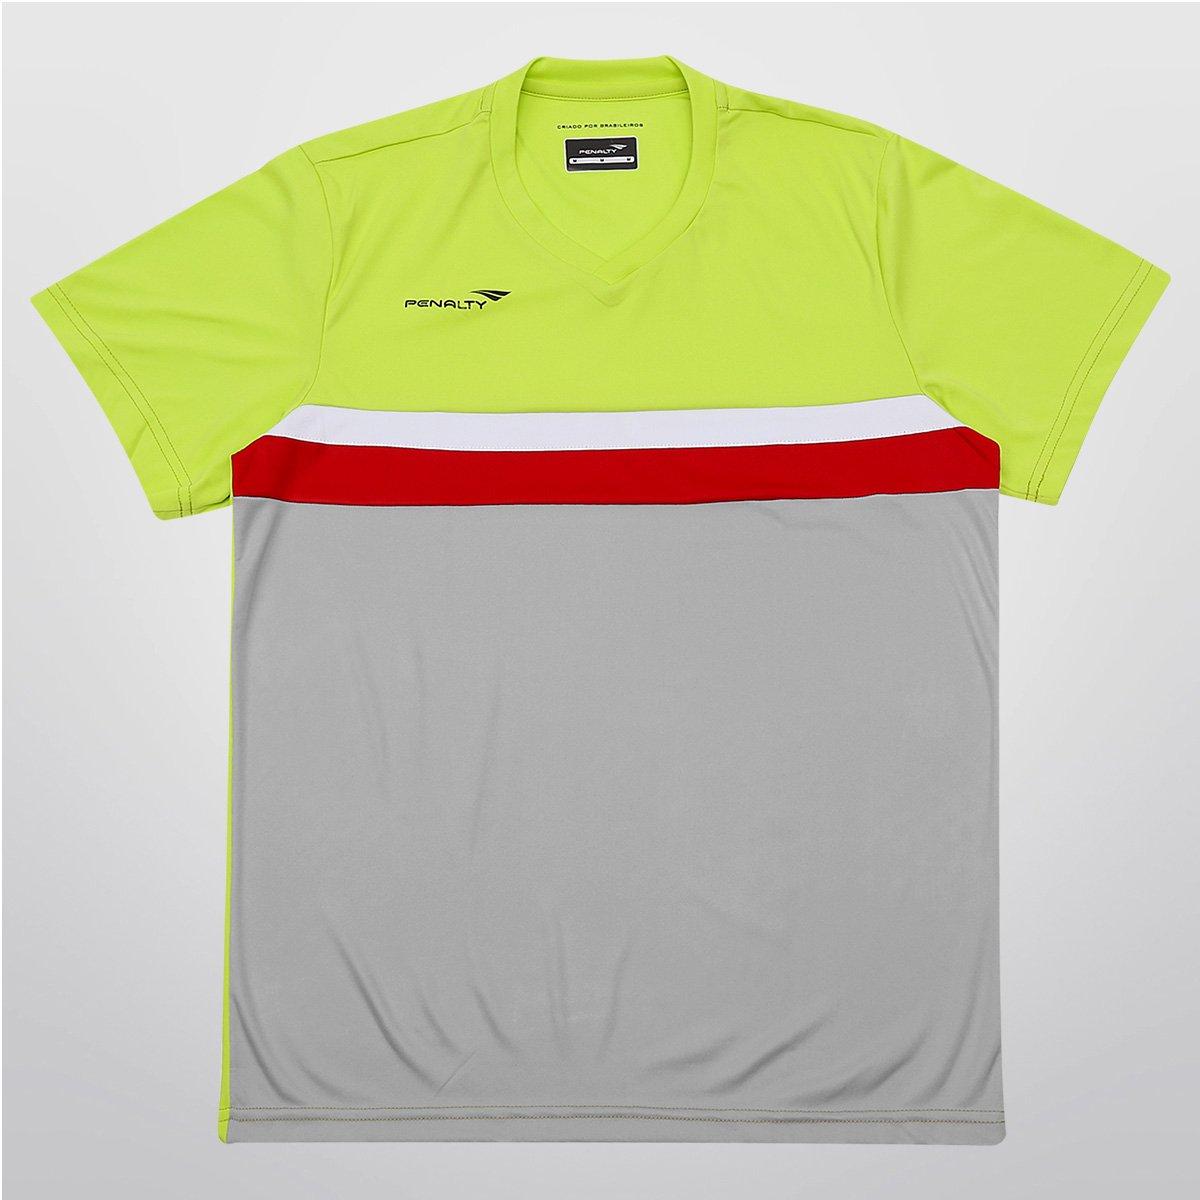 ea2cfe2a248b6 Camisa Penalty Digital 2015 - Compre Agora